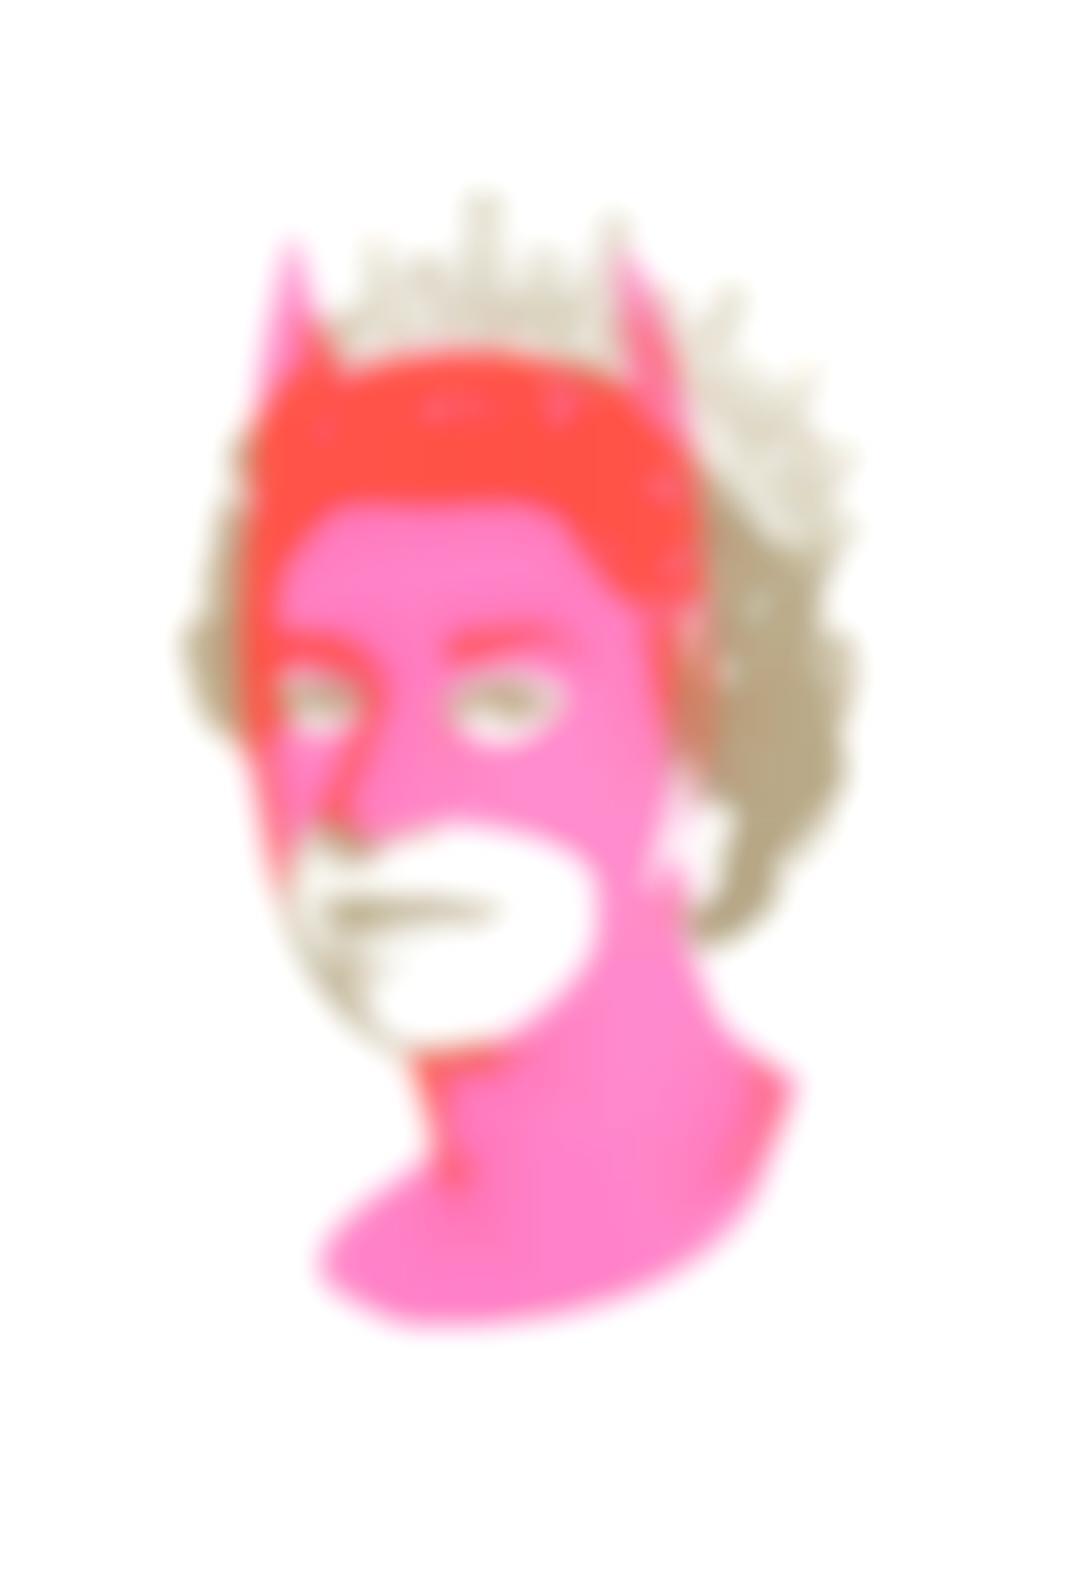 Heath Kane-Rich Enough To Be Batman - Pink And Gold-2015